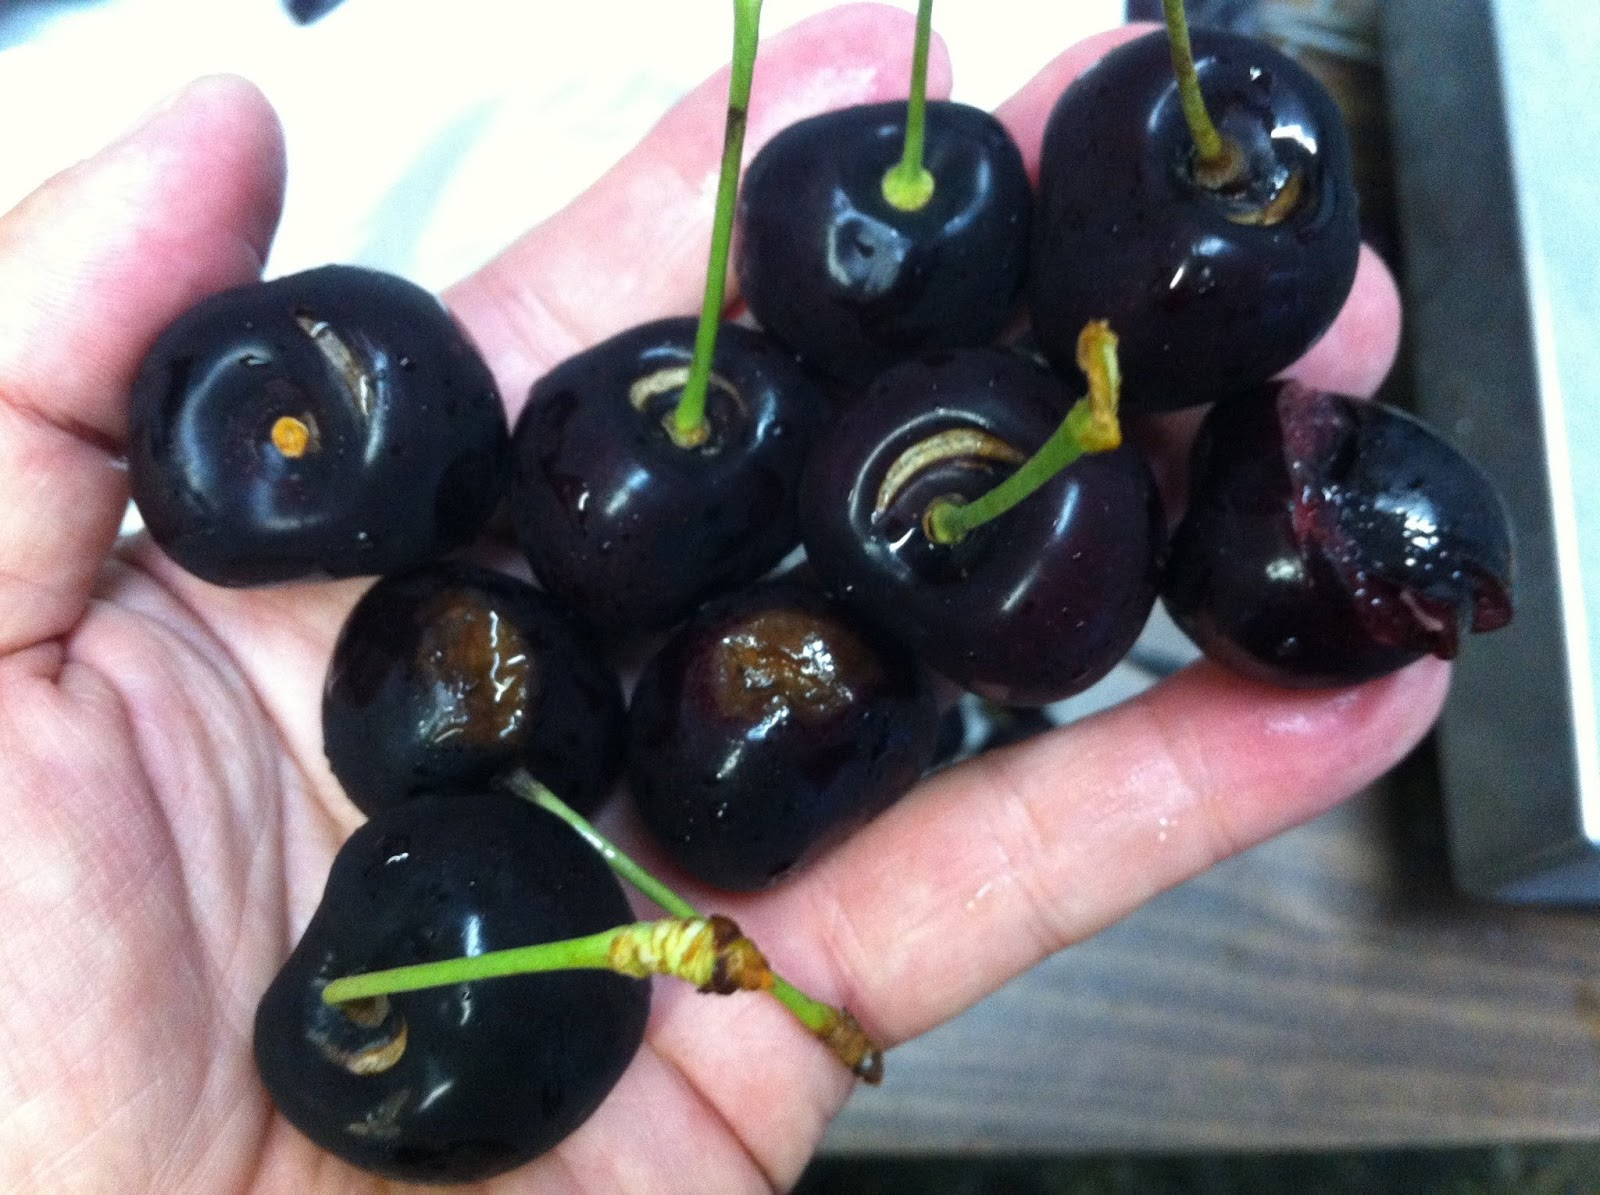 produce clerk the produce clerks handbook by rick chong culled cherries during packing stem bowl splits brown rot cracks